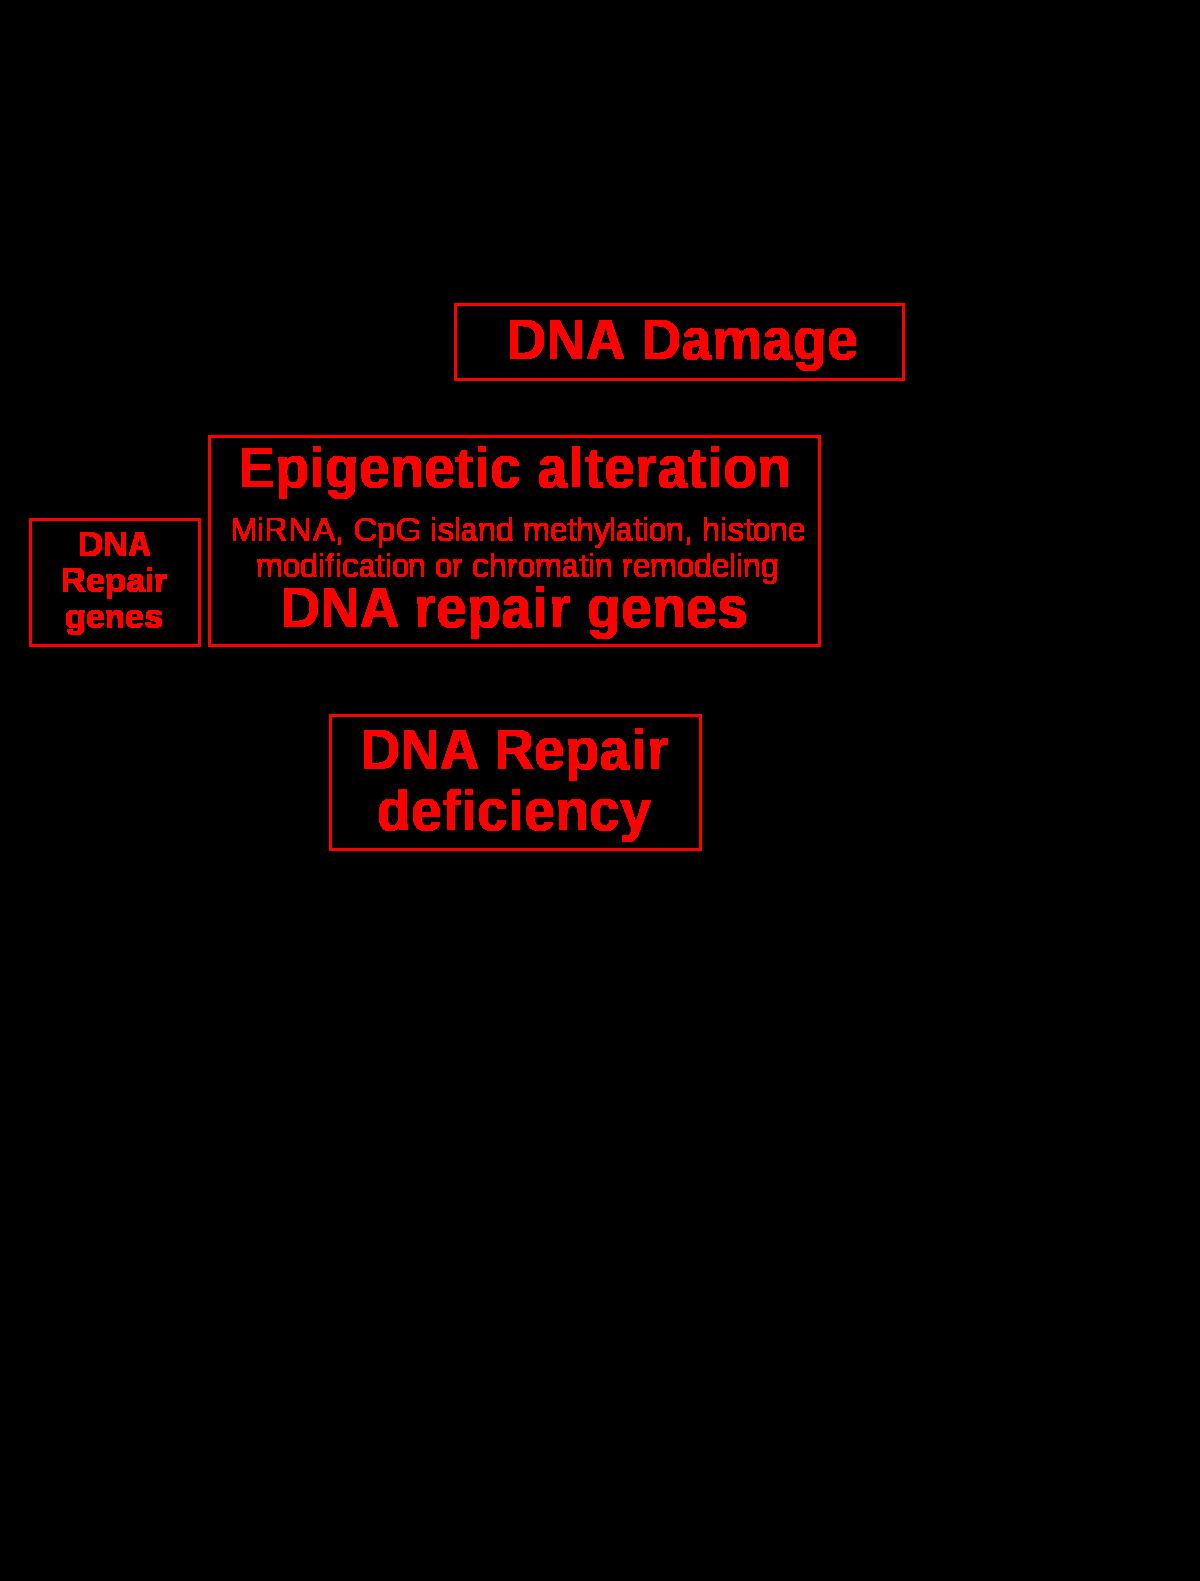 endometrium rák 1b stádium